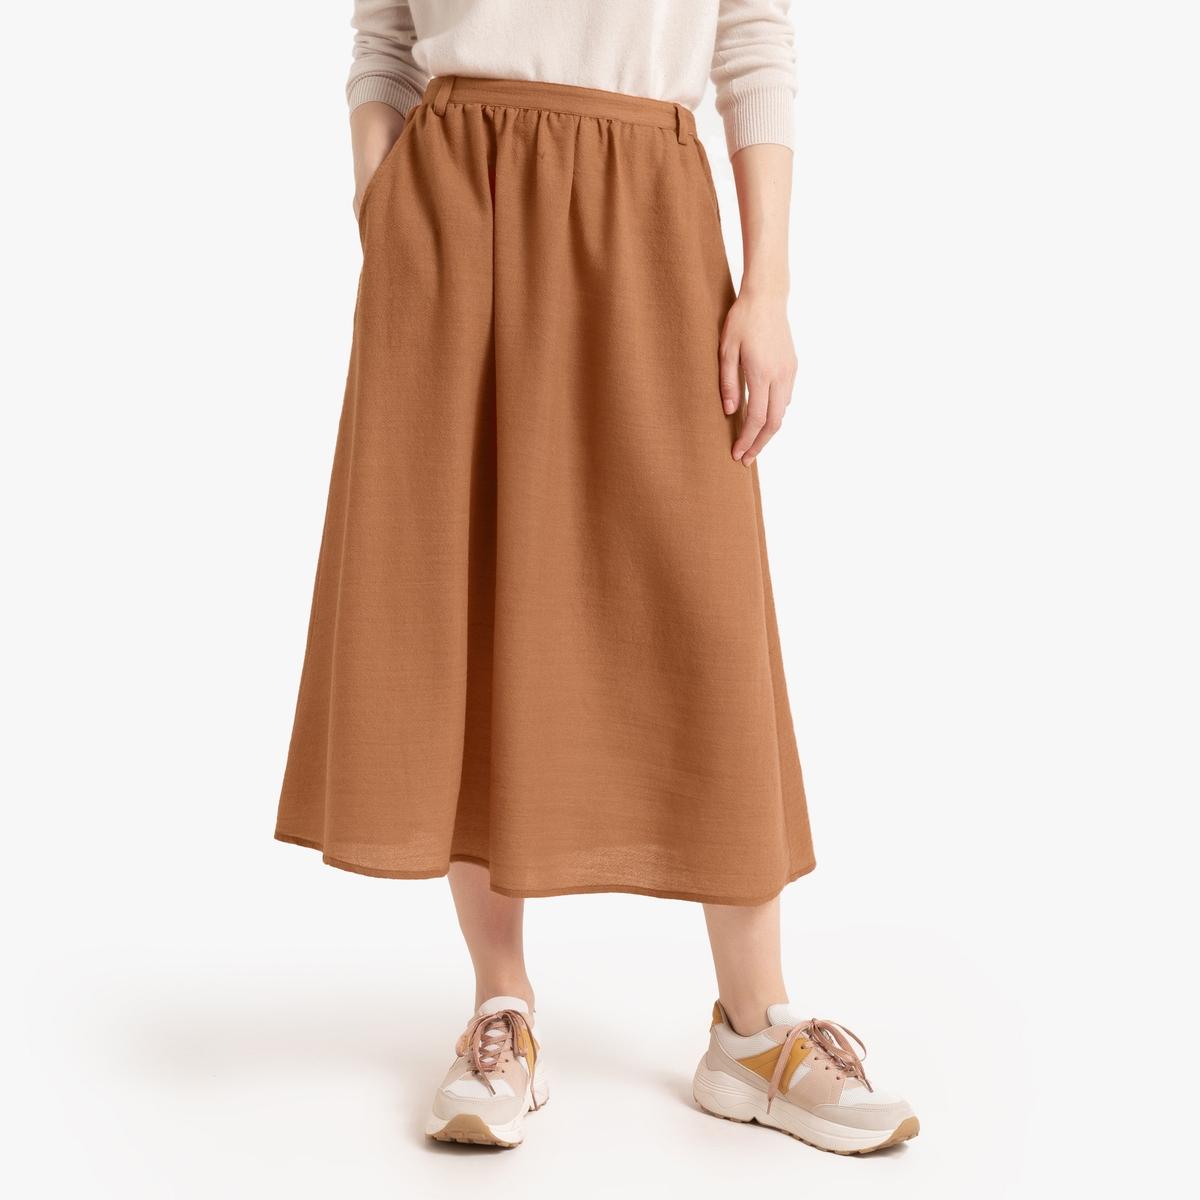 Falda larga de estameña de lana